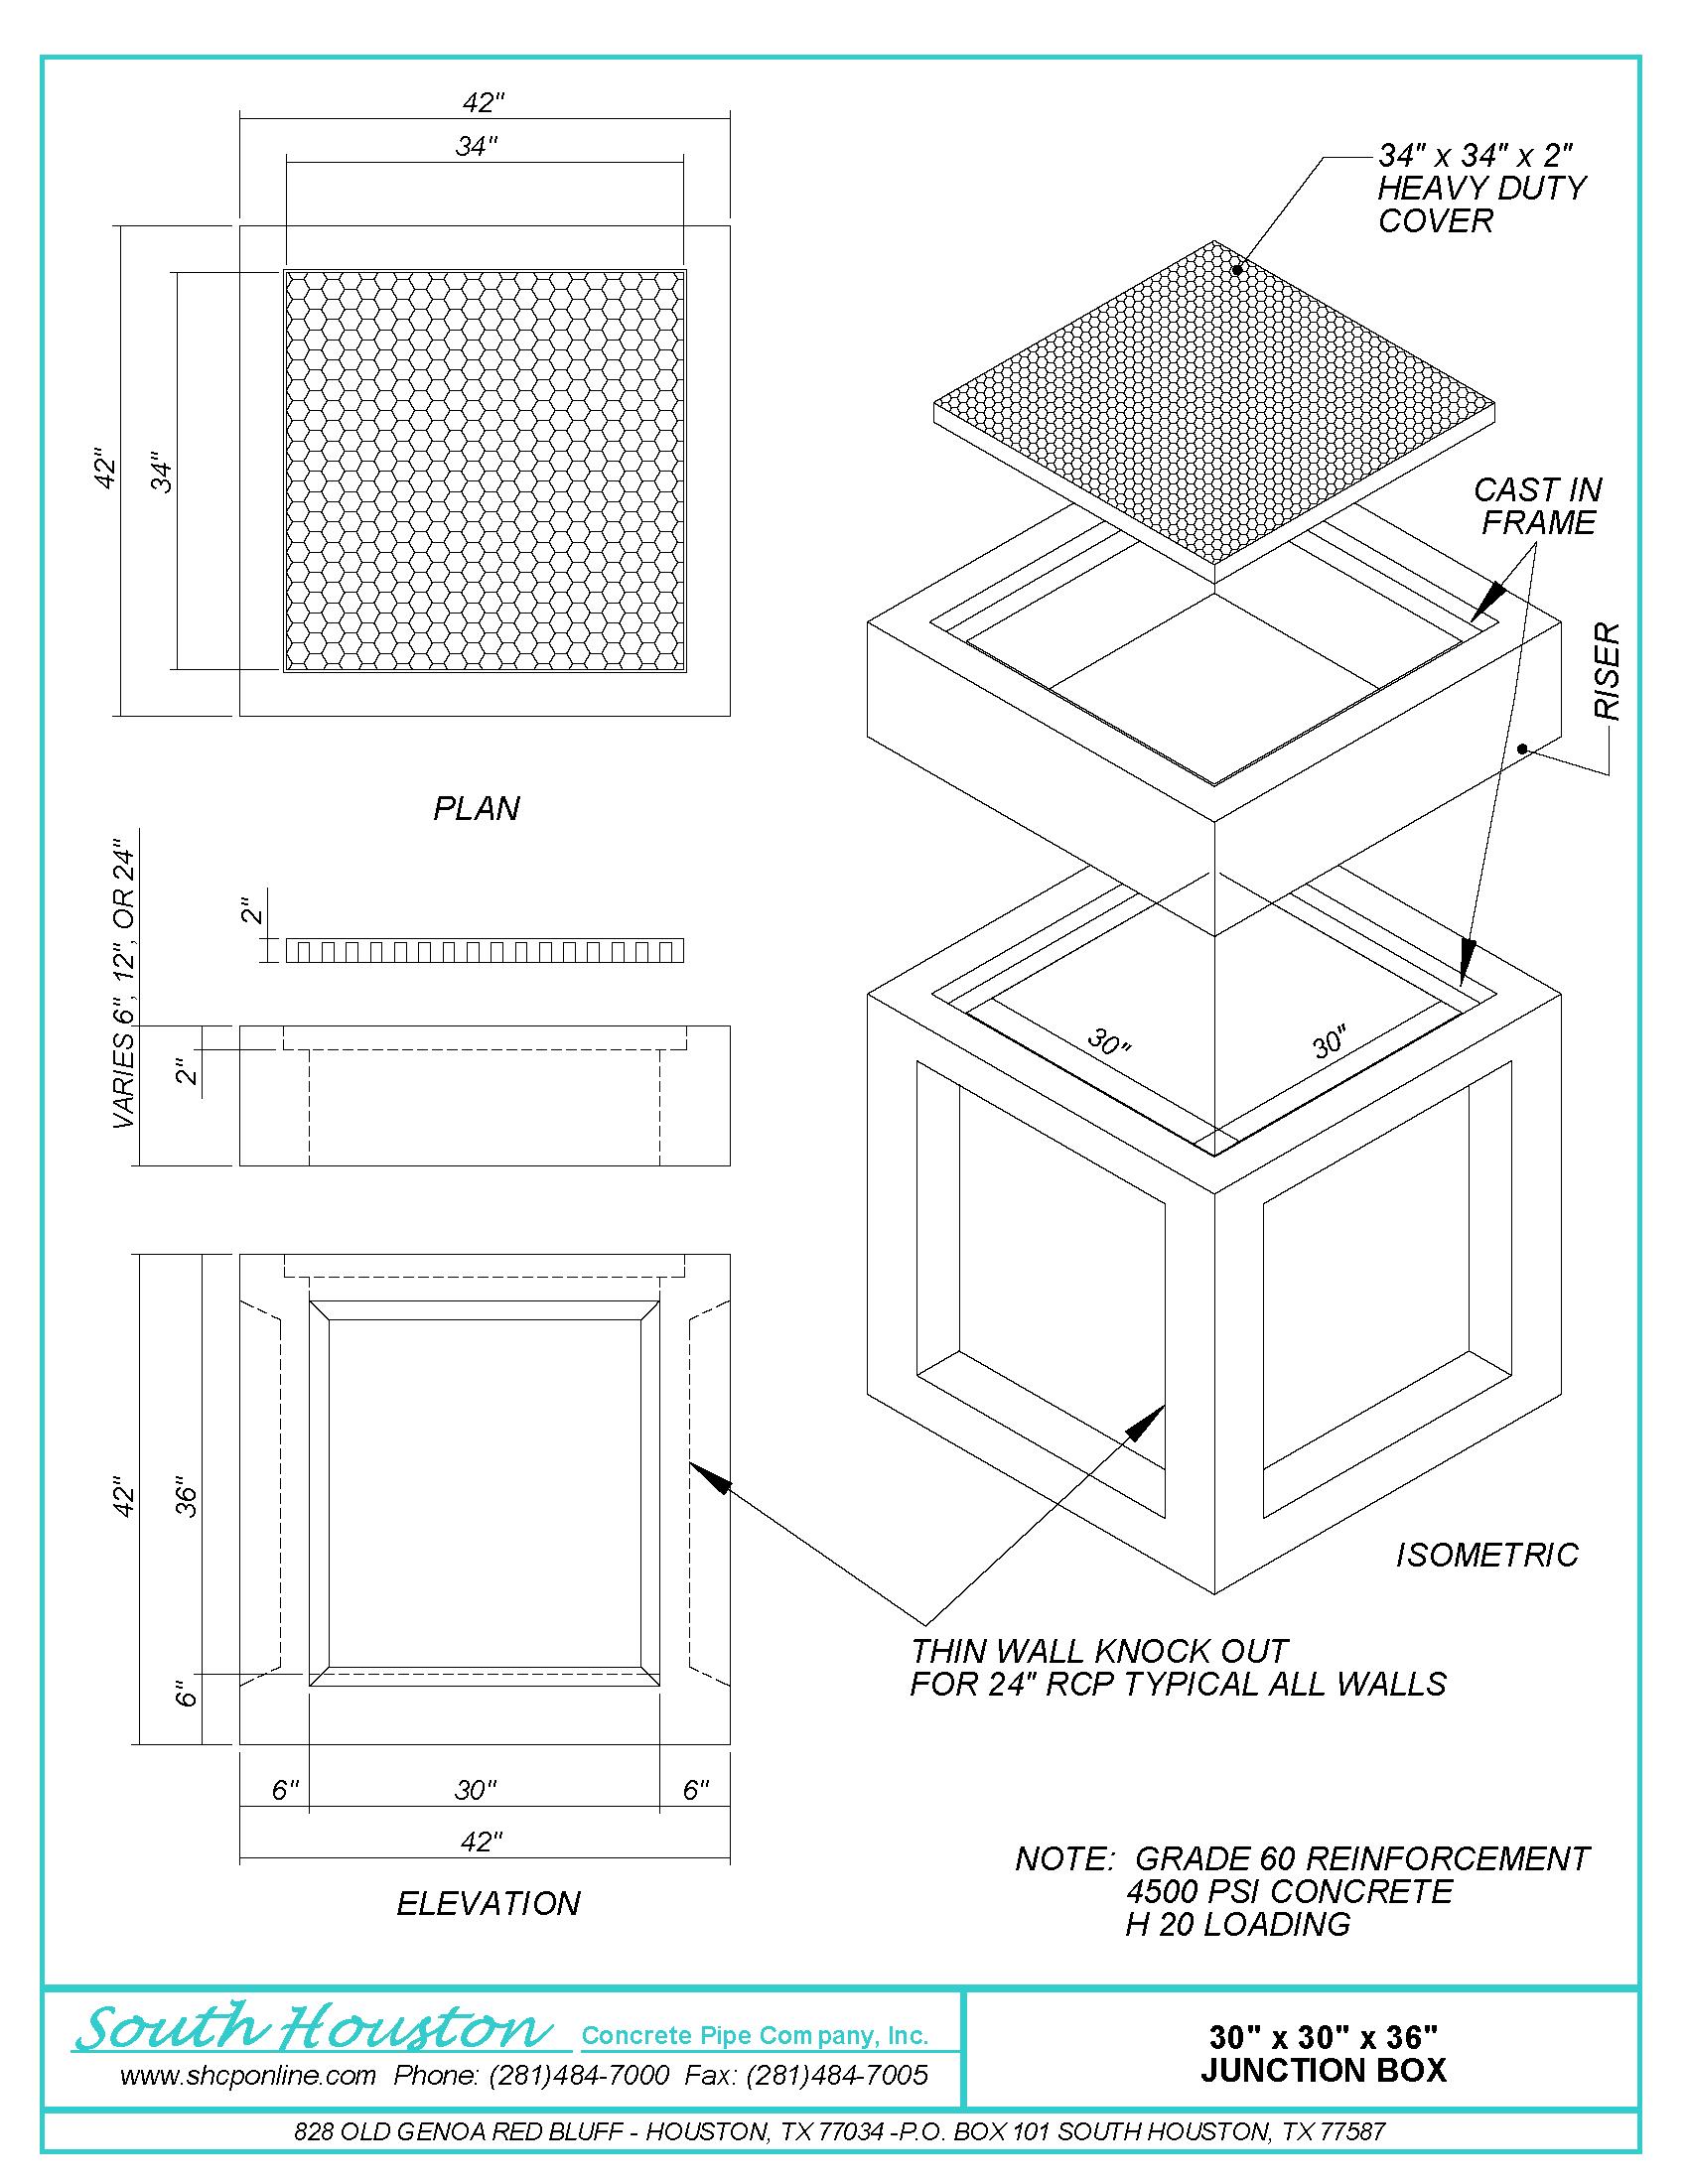 Junction Boxes South Houston Concrete Pipe Company Inc